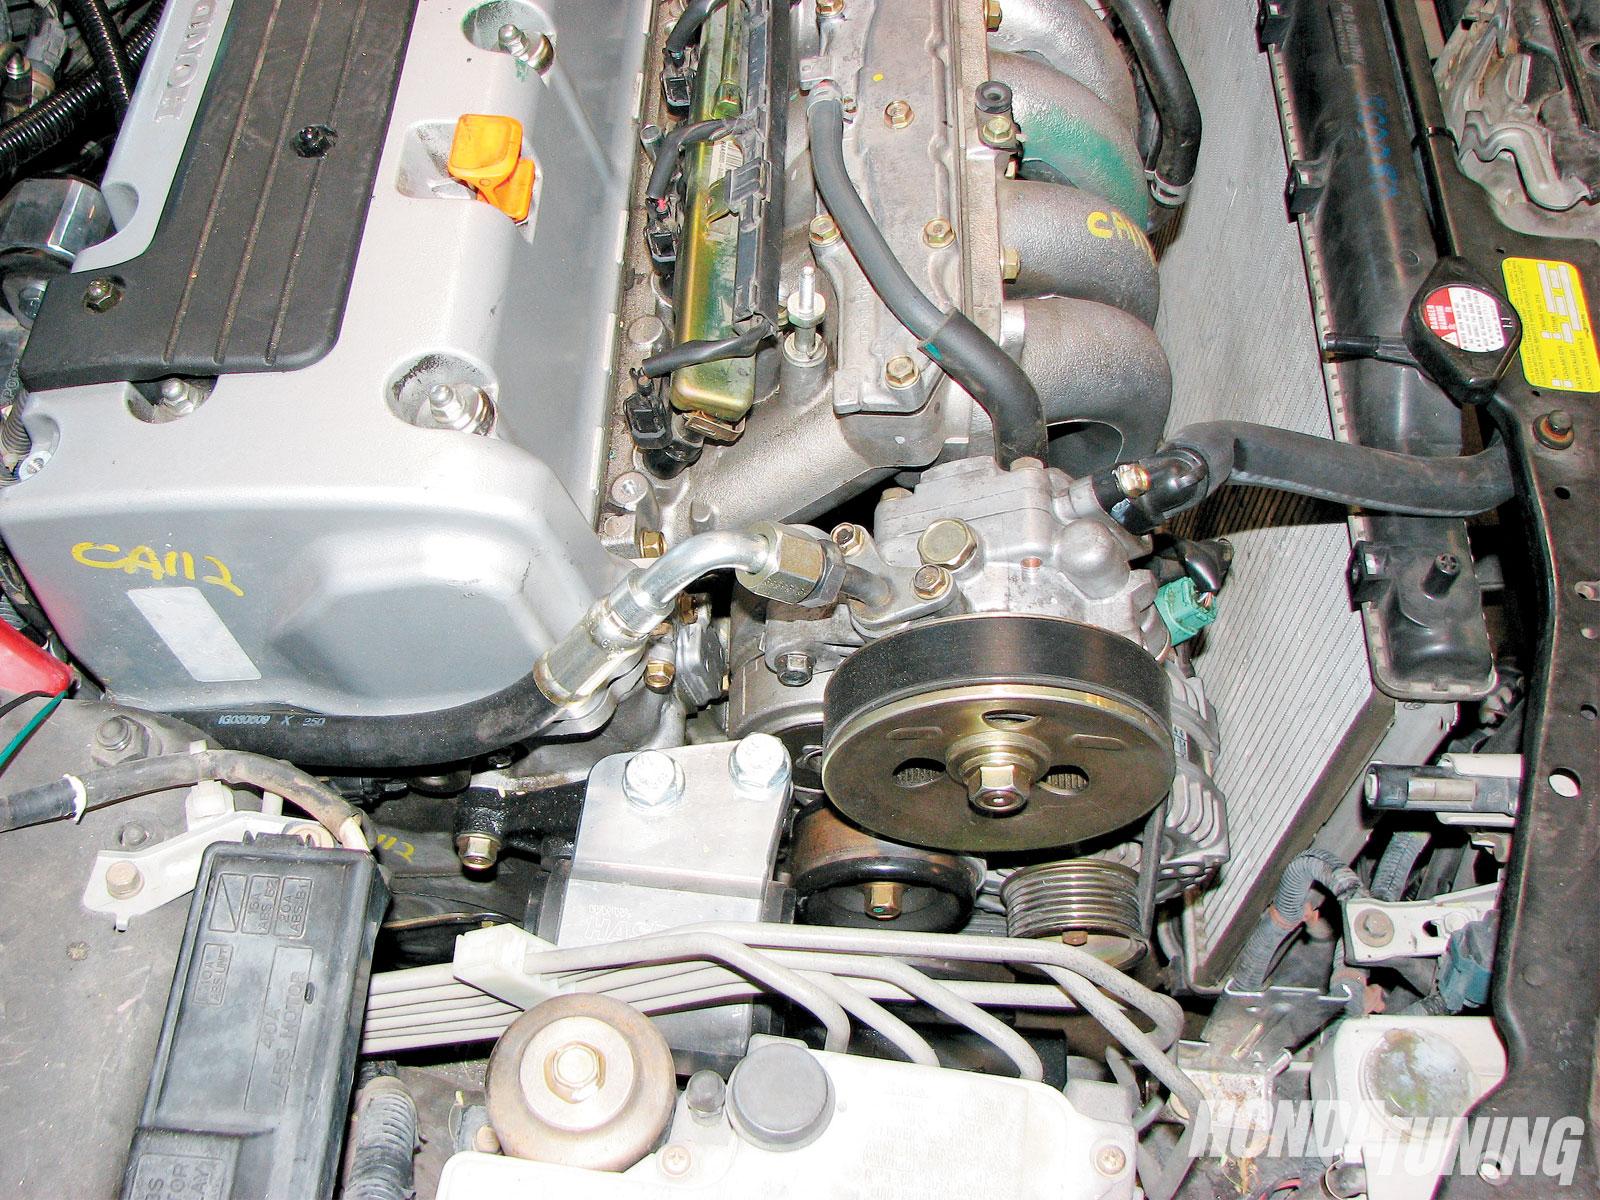 hight resolution of honda accord k24 engine swap honda tuning magazinhtup 1007 07 o honda accord k24 engine swap